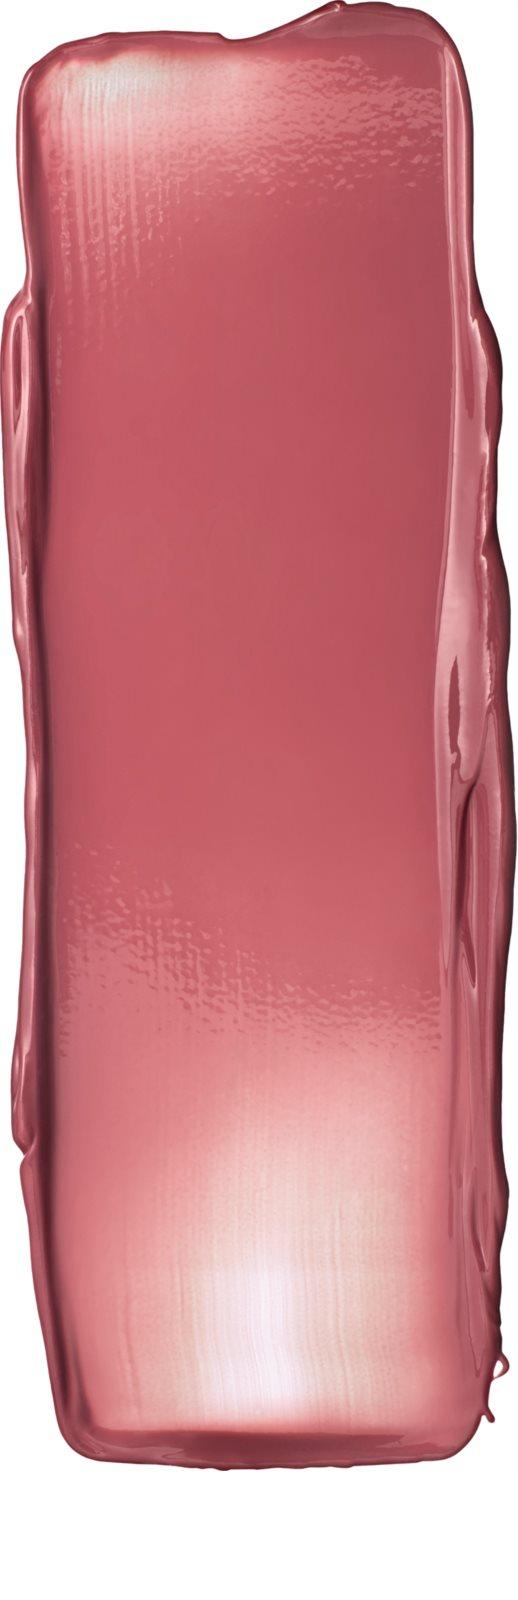 Помада Pink Perricone USA 4.2 г(р) — фото №2